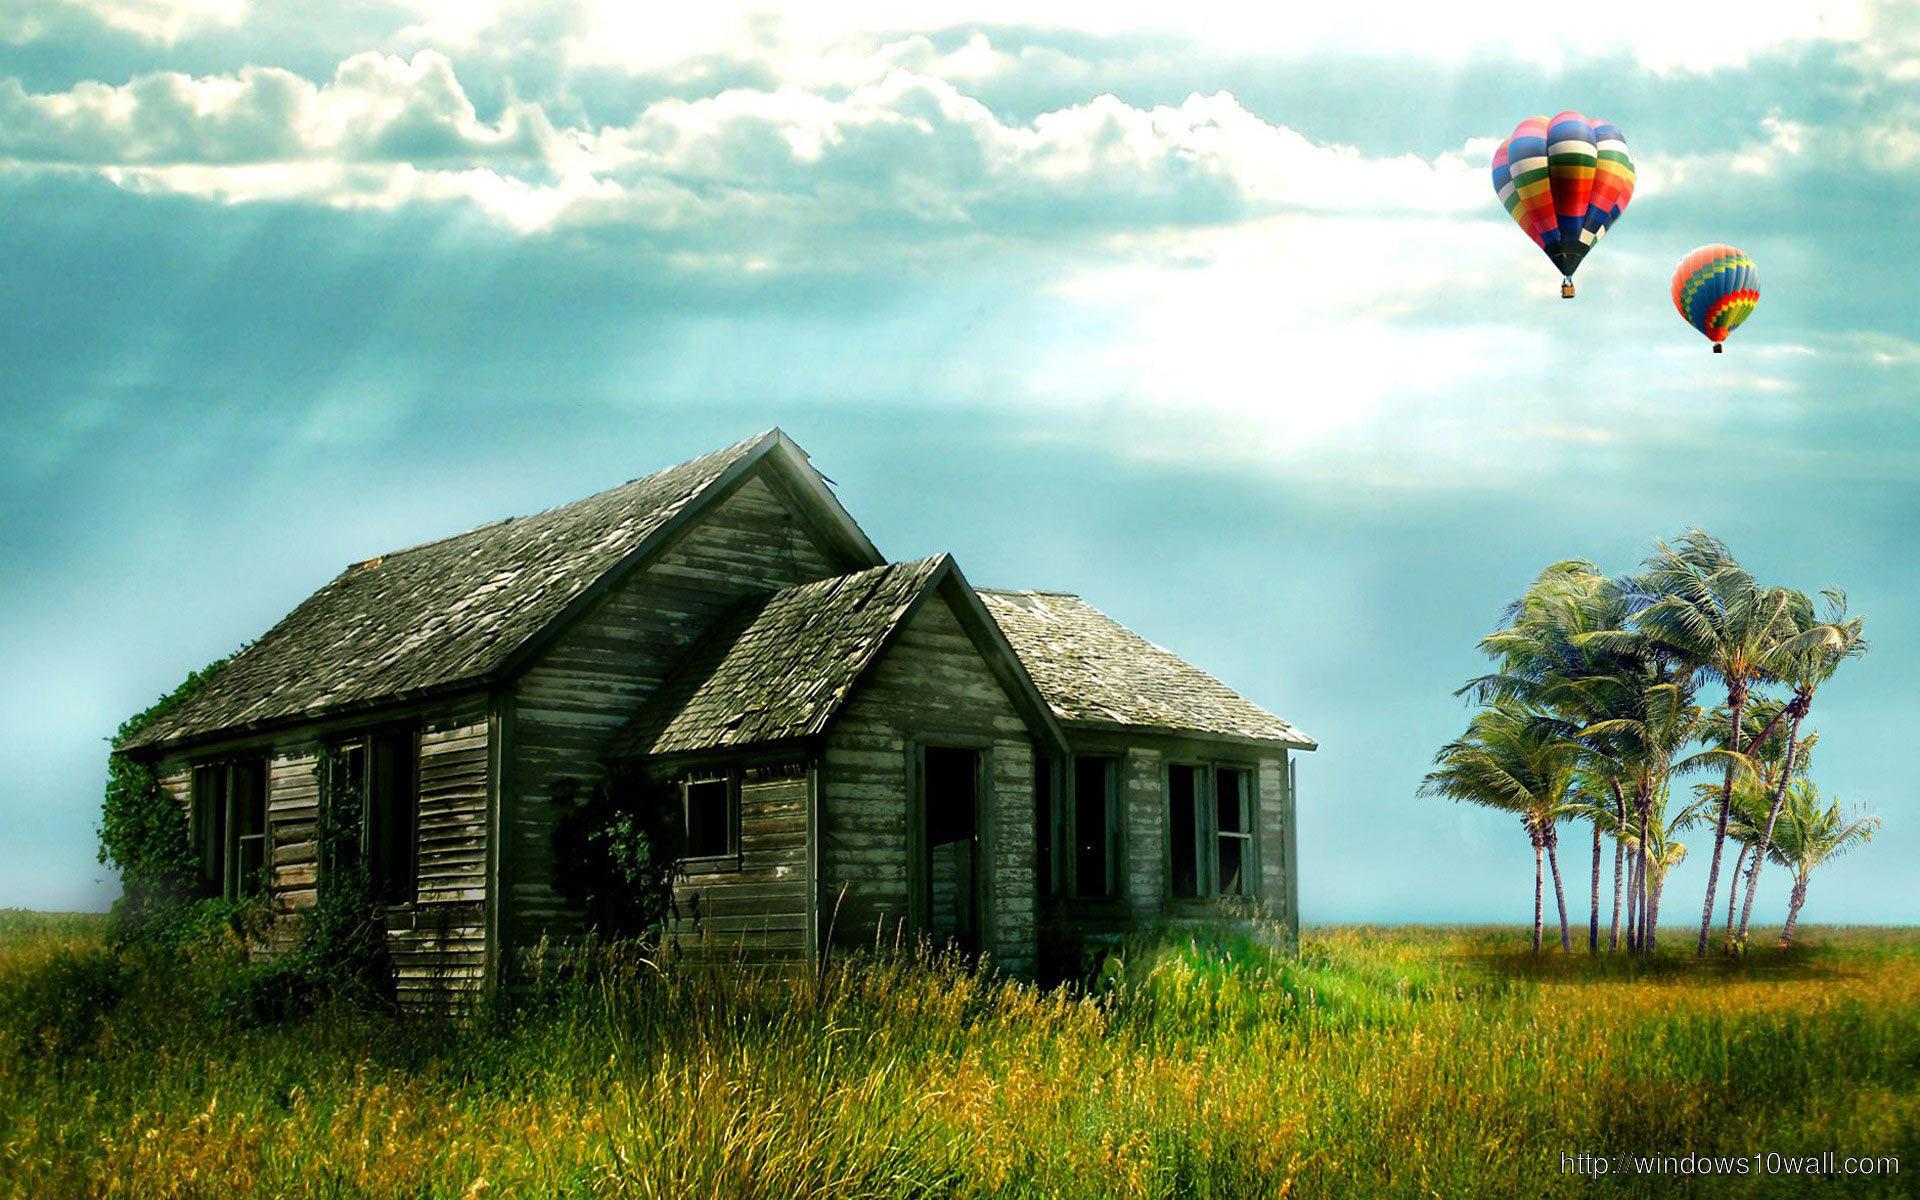 Free HD Desktop Background Wallpaper with Hot Air Balloon